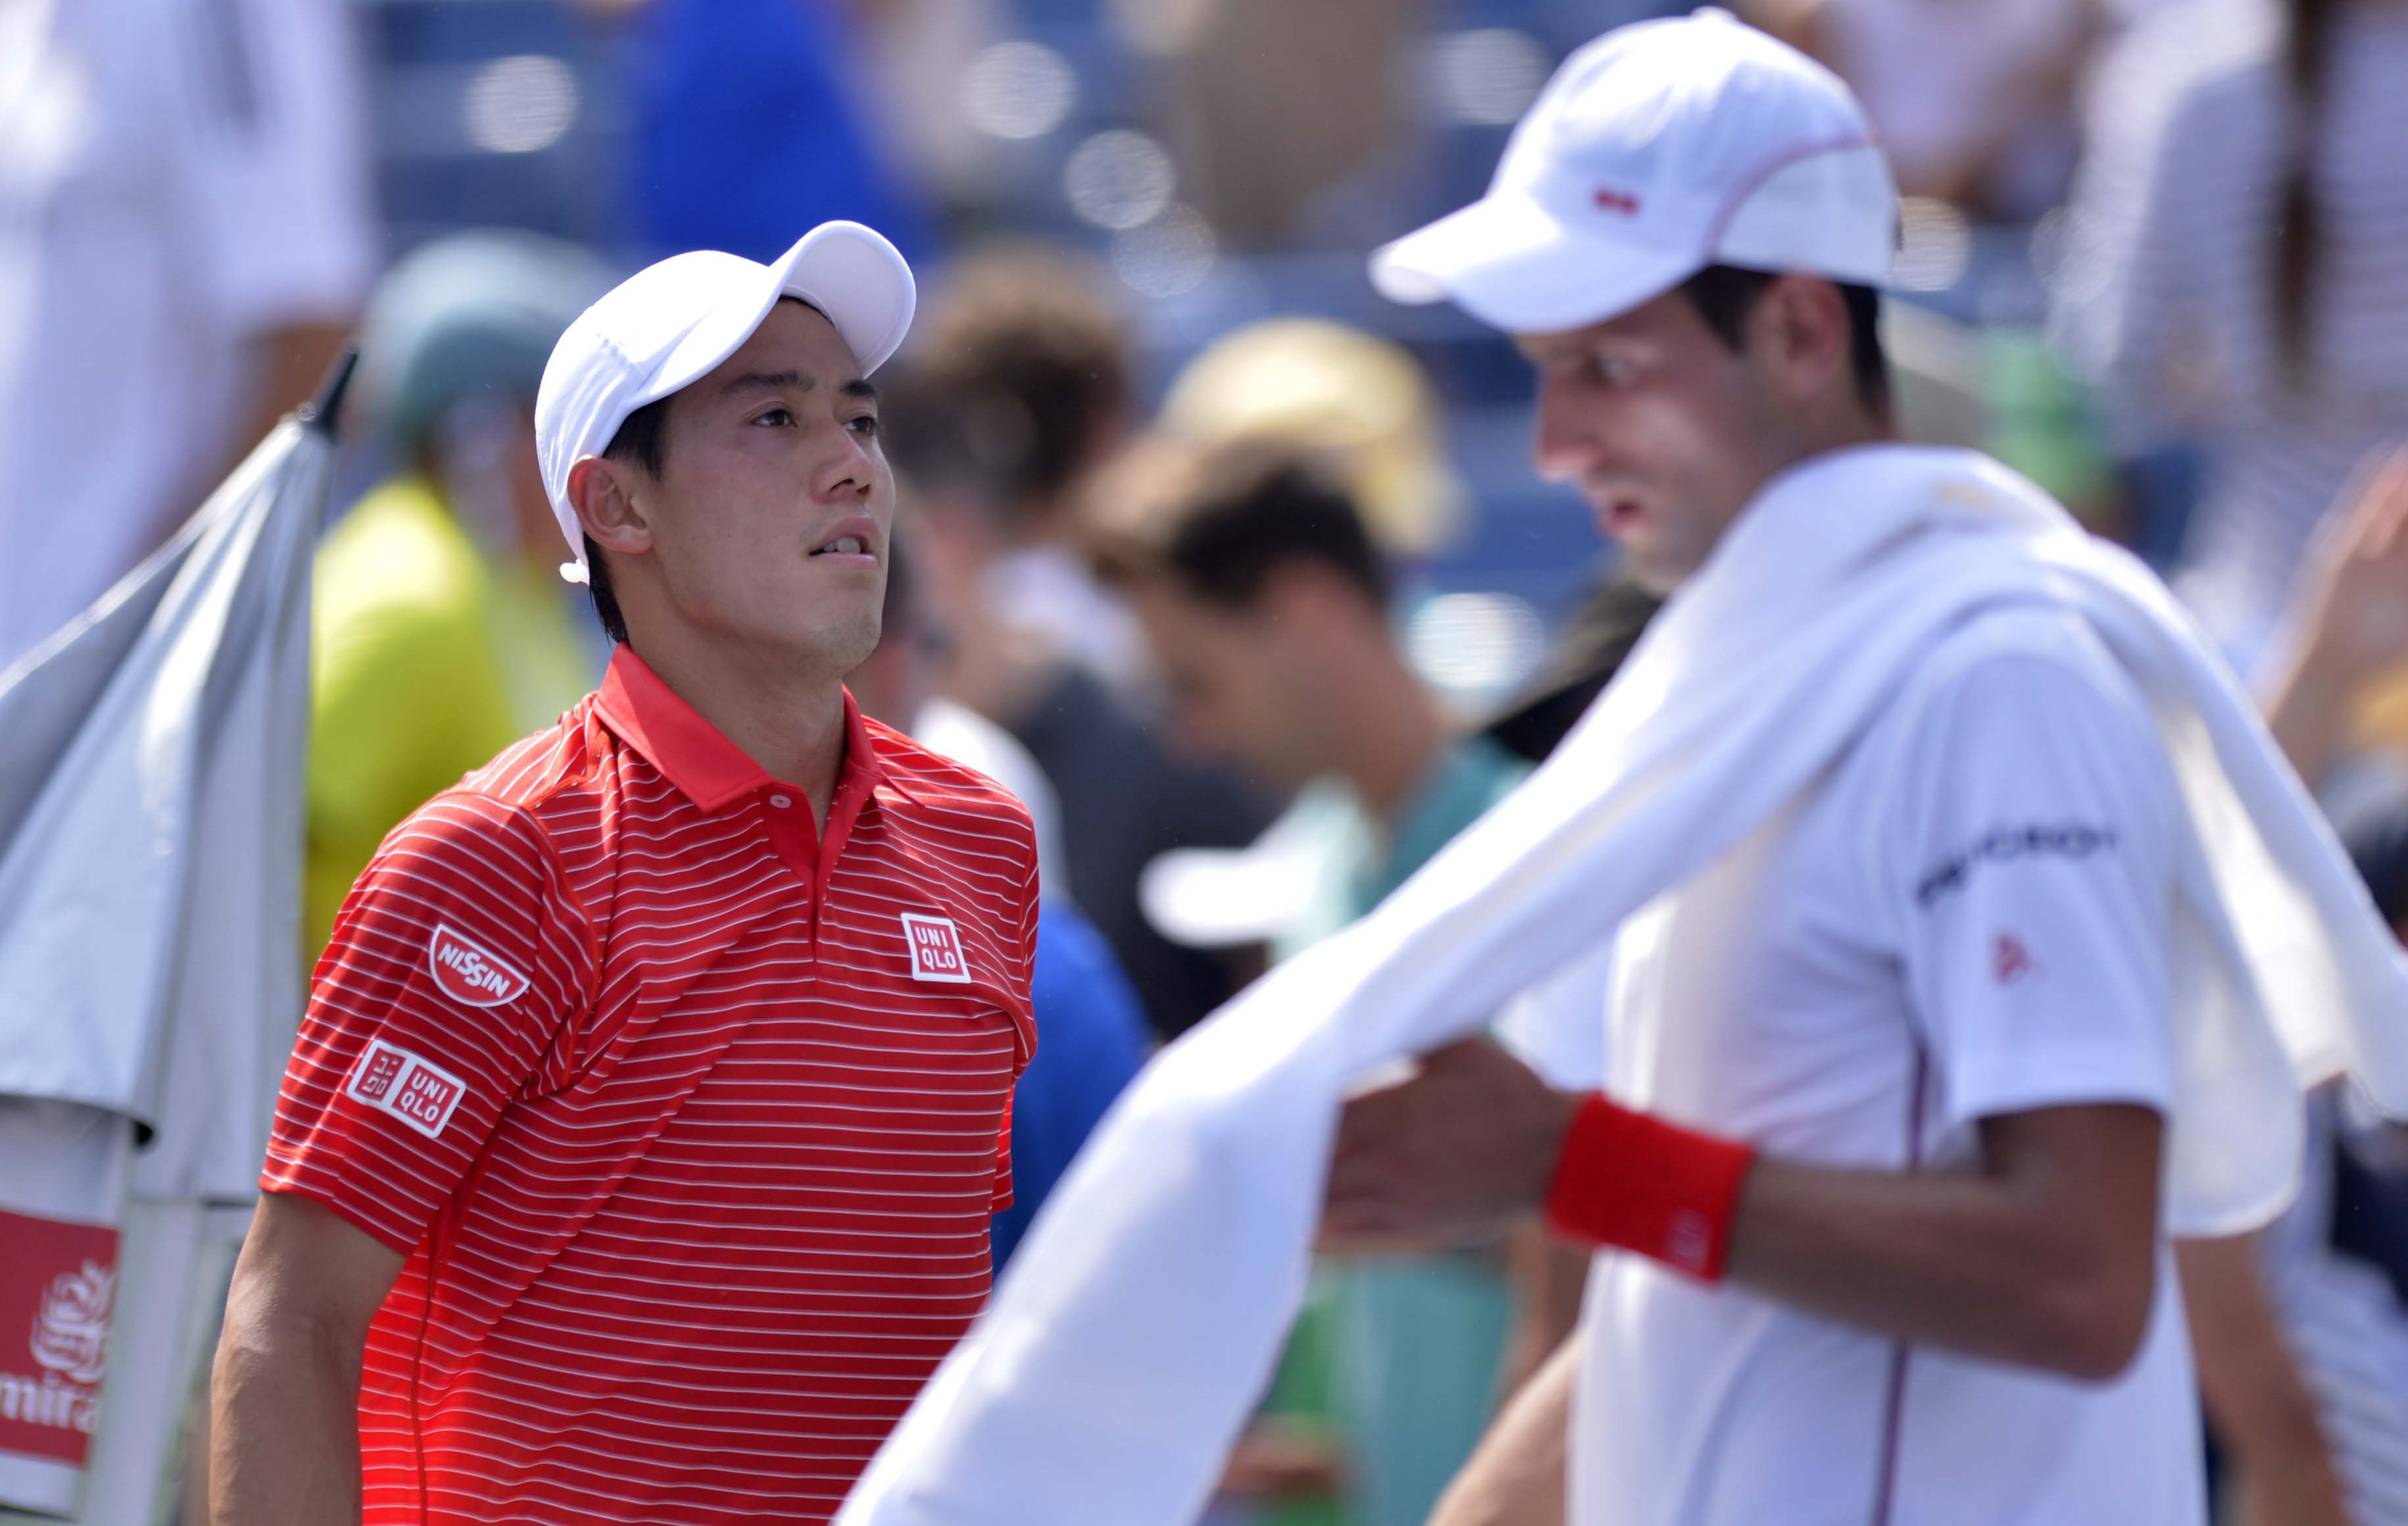 Tennis : ATP - Djokovic pr�t pour la revanche contre Nishikori